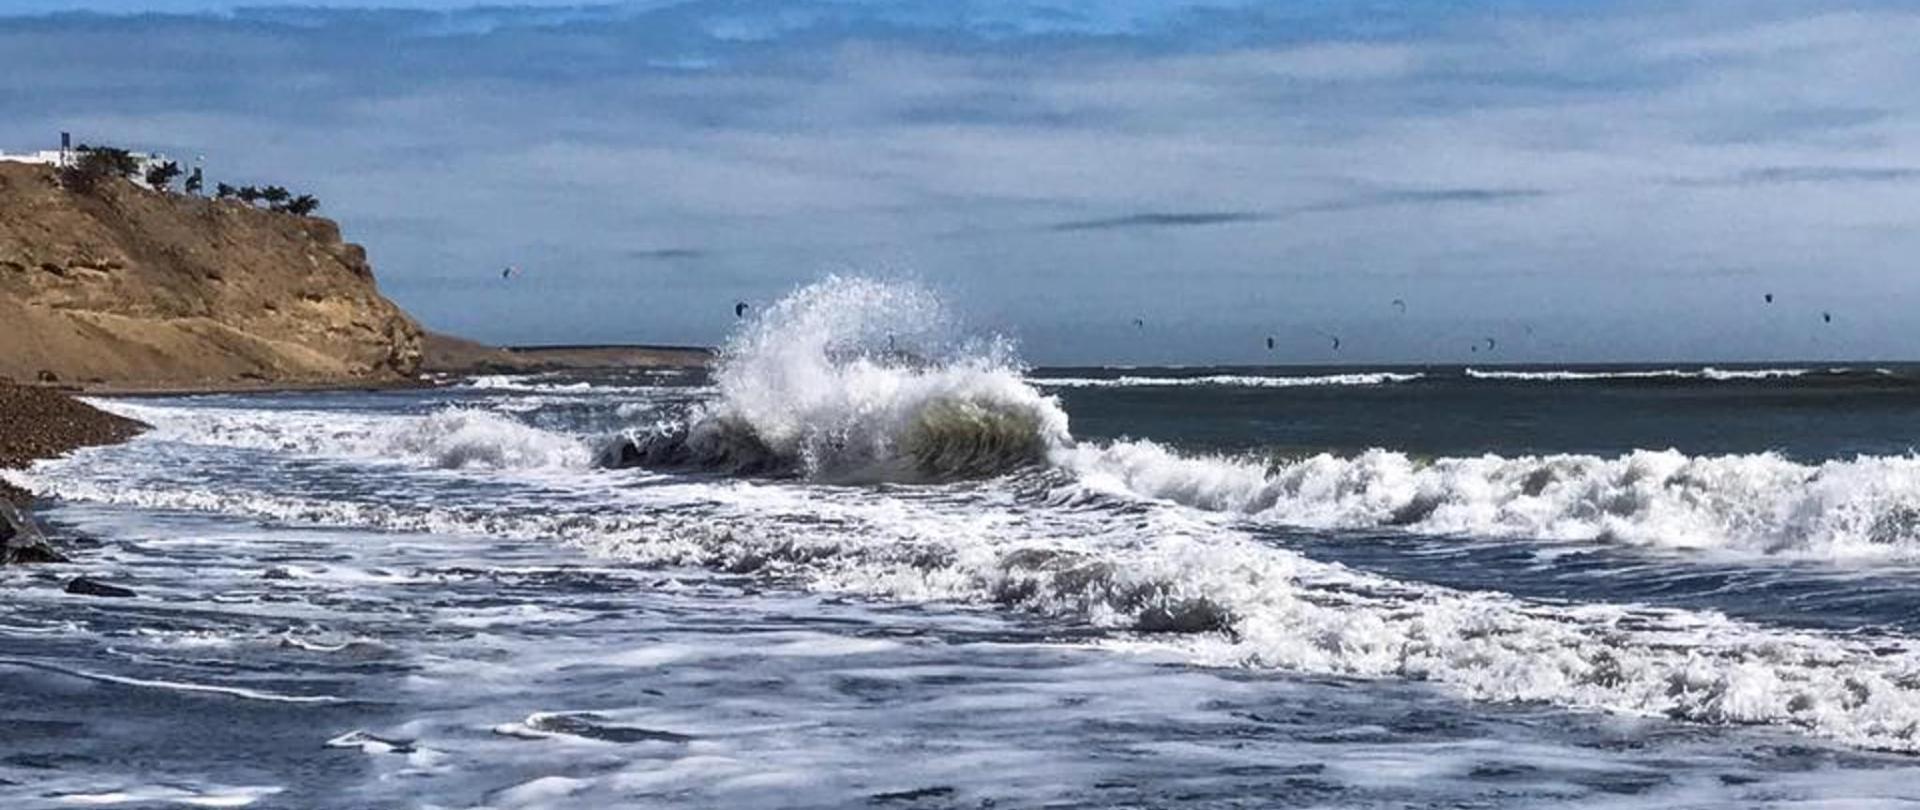 Surf Hotel Hospedaje El Mirador Pacasmayo Peru playa 2.jpg